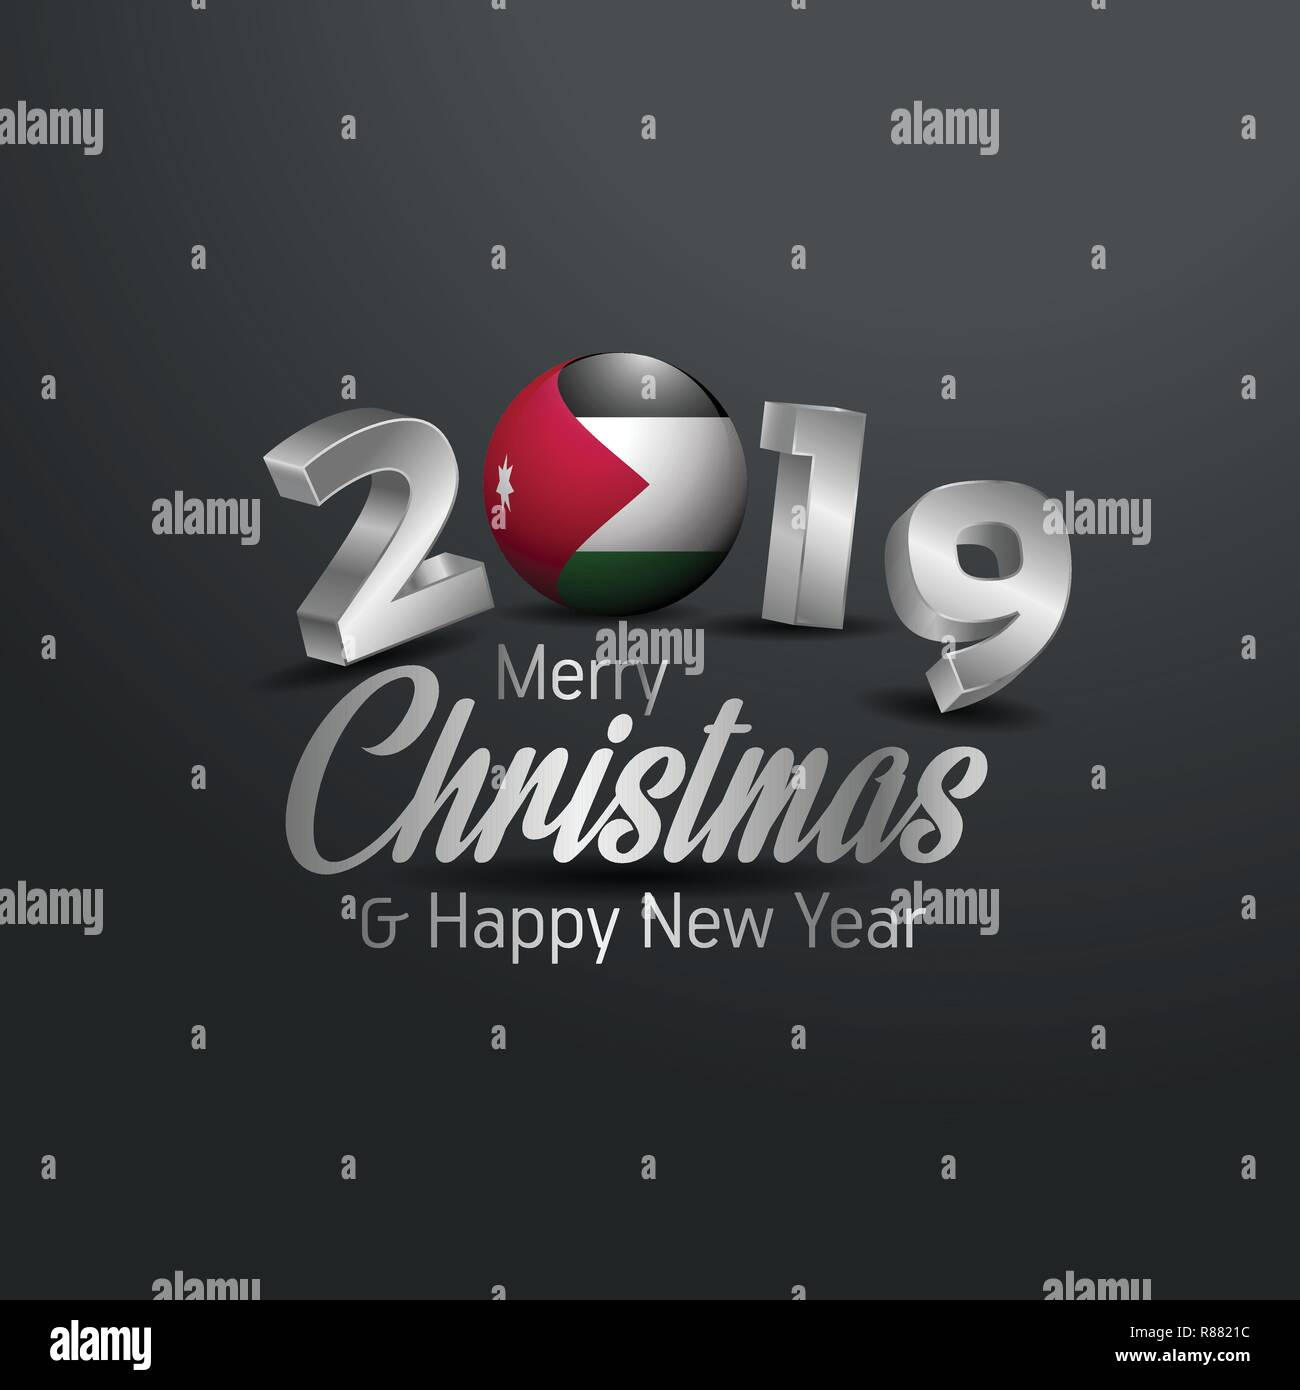 Jordans Christmas 2019.Jordan Flag 2019 Merry Christmas Typography New Year